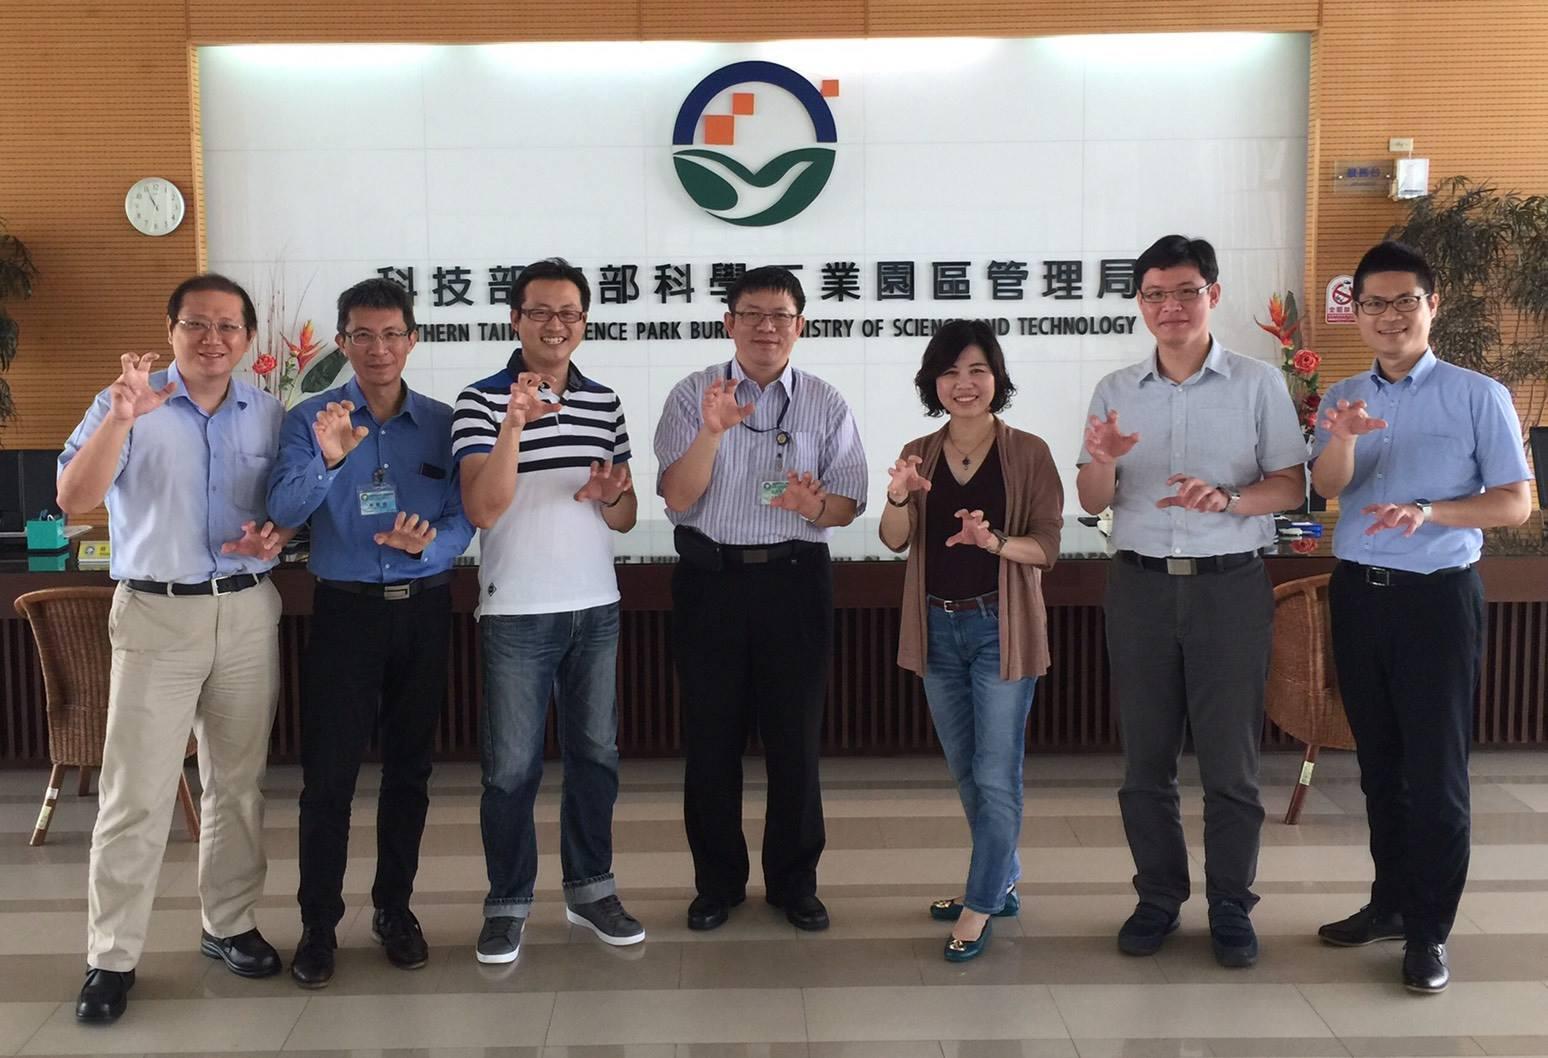 StarFab x Southern Taiwan Science Park